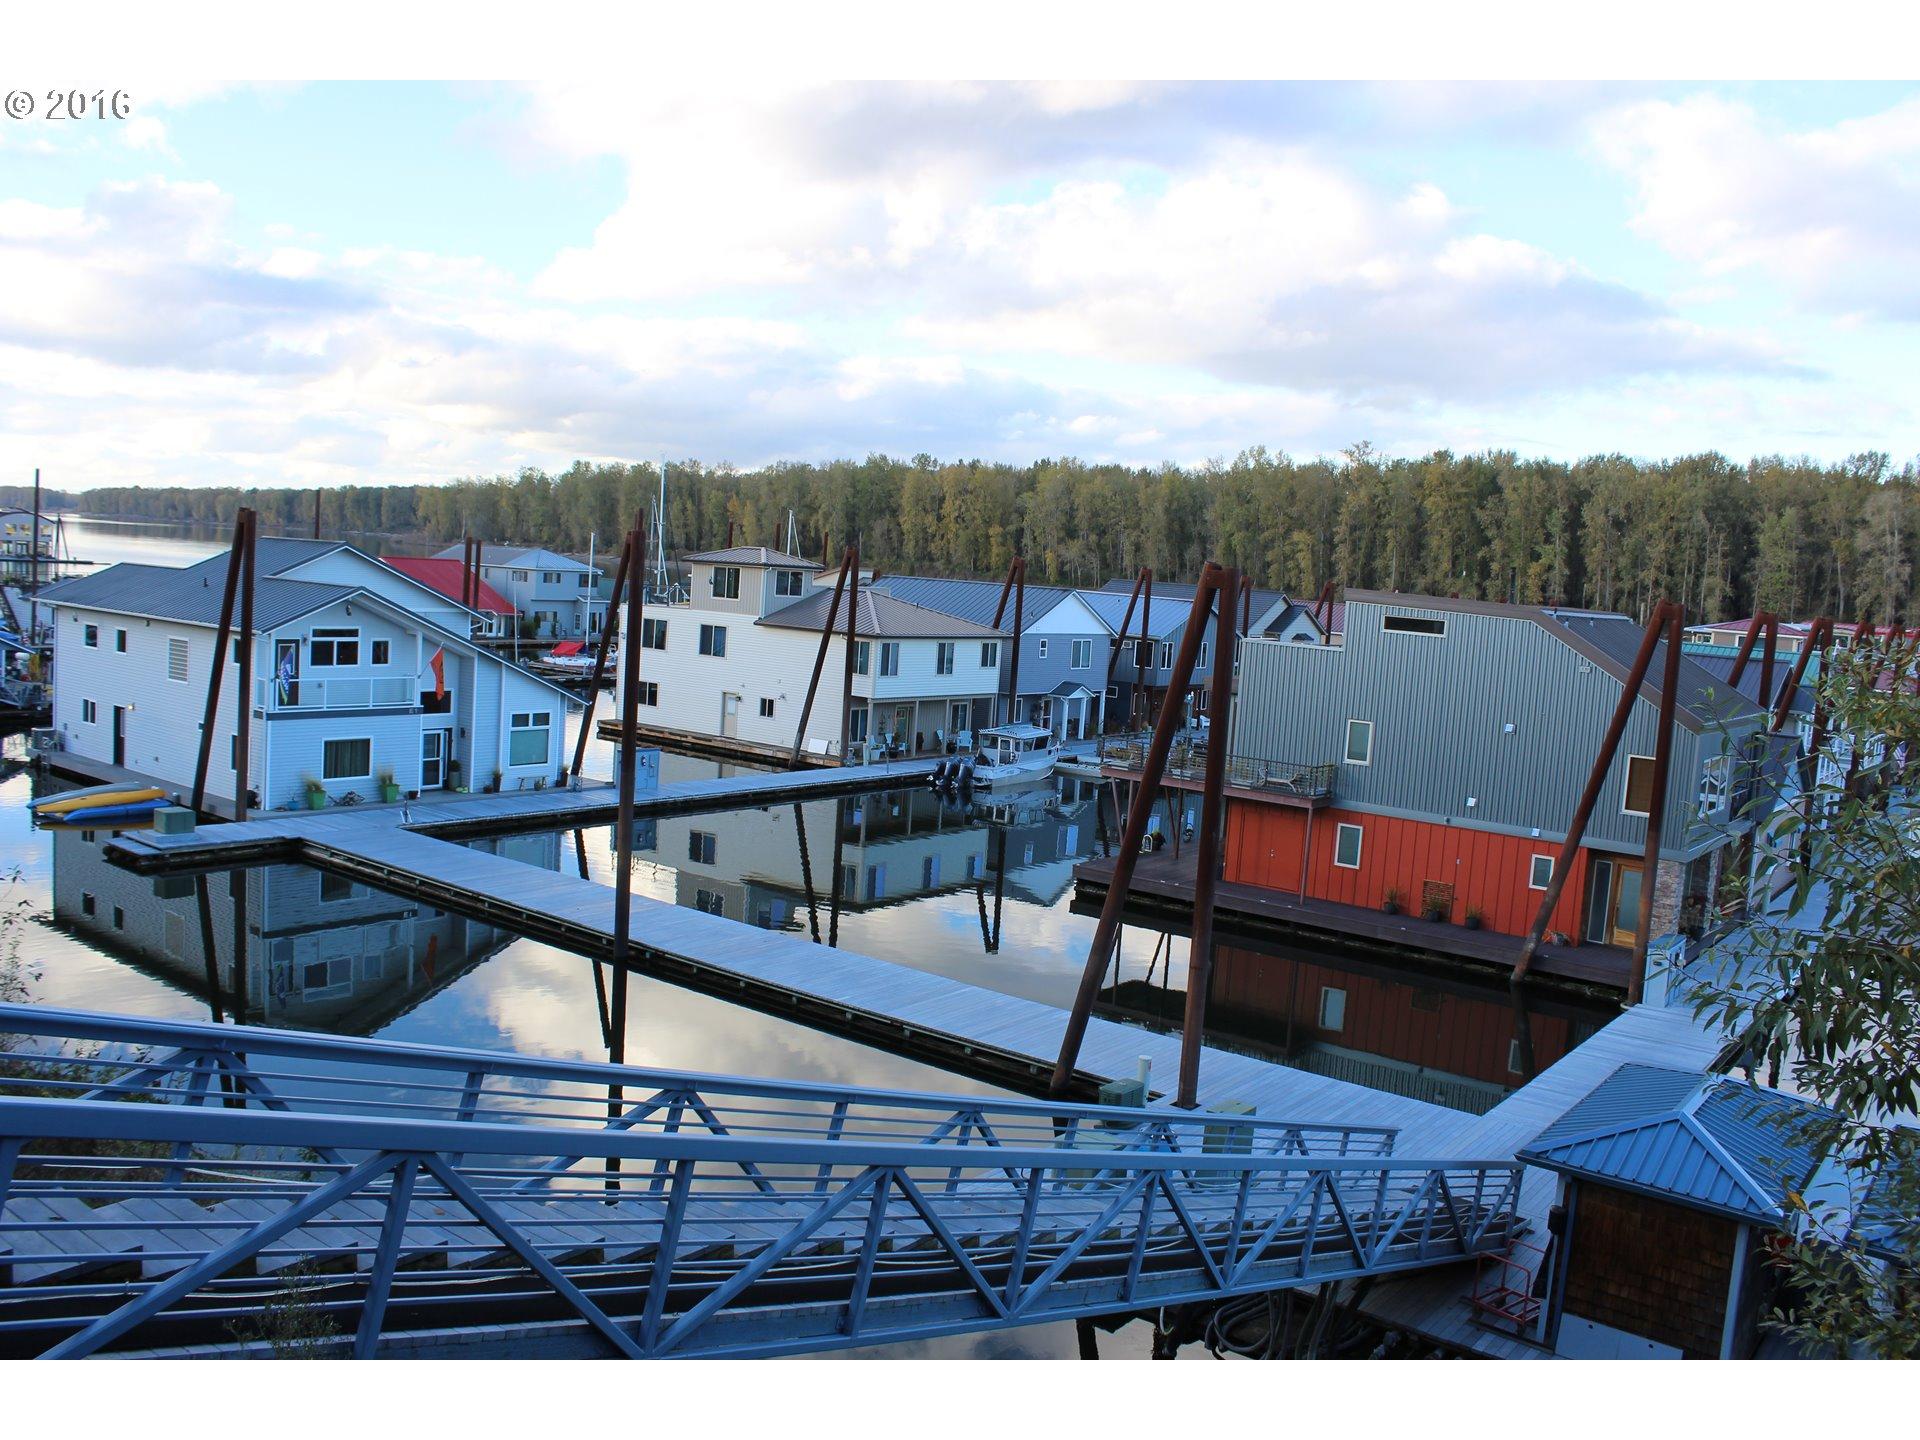 Floating Homes for Sale in Portland Oregon Floating Home 4 Photo 2